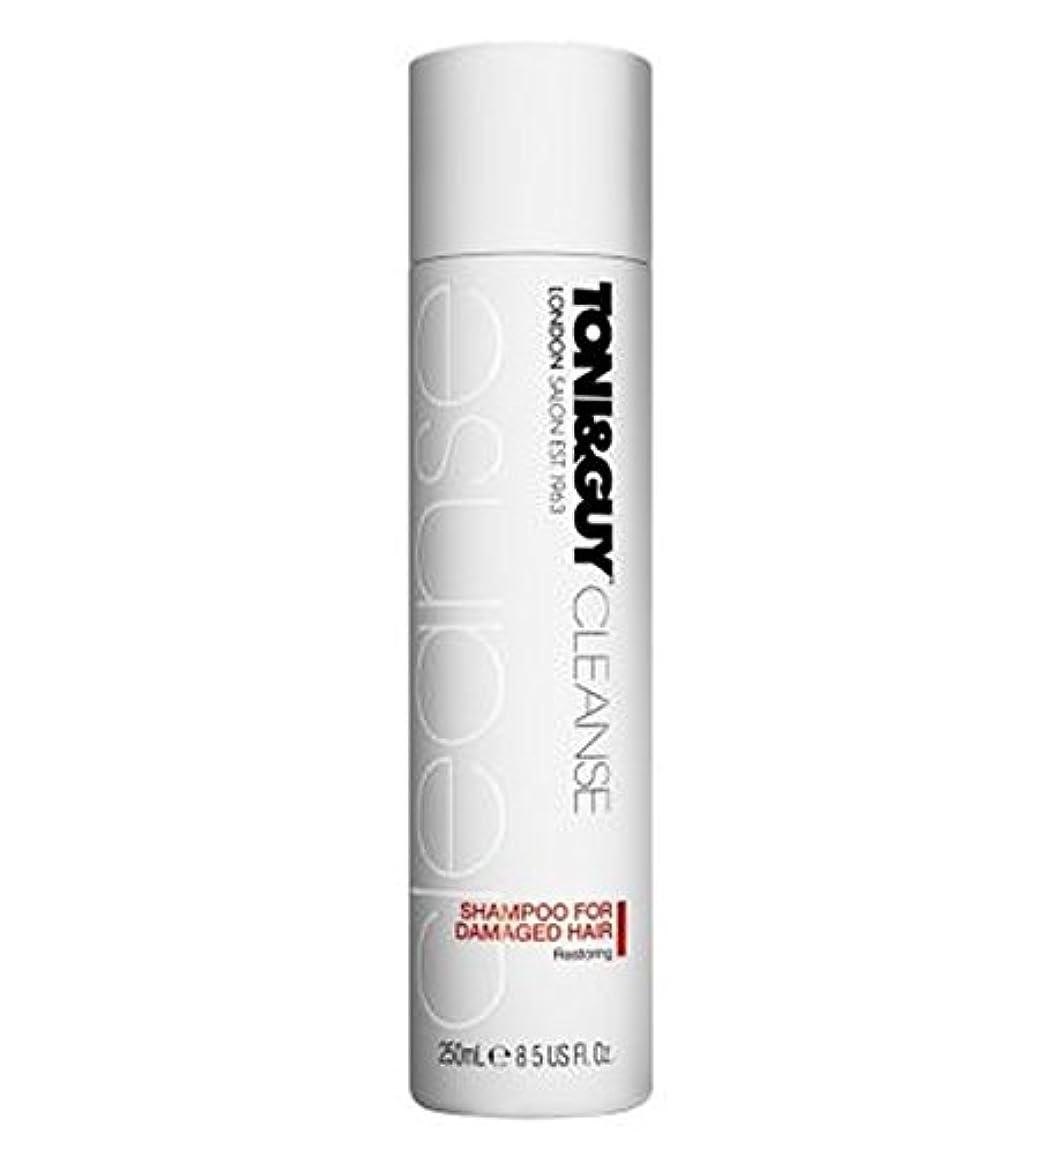 Toni&Guy Cleanse Shampoo for Damaged Hair 250ml - 傷んだ髪の250ミリリットルのためのトニ&男クレンジングシャンプー (Toni & Guy) [並行輸入品]